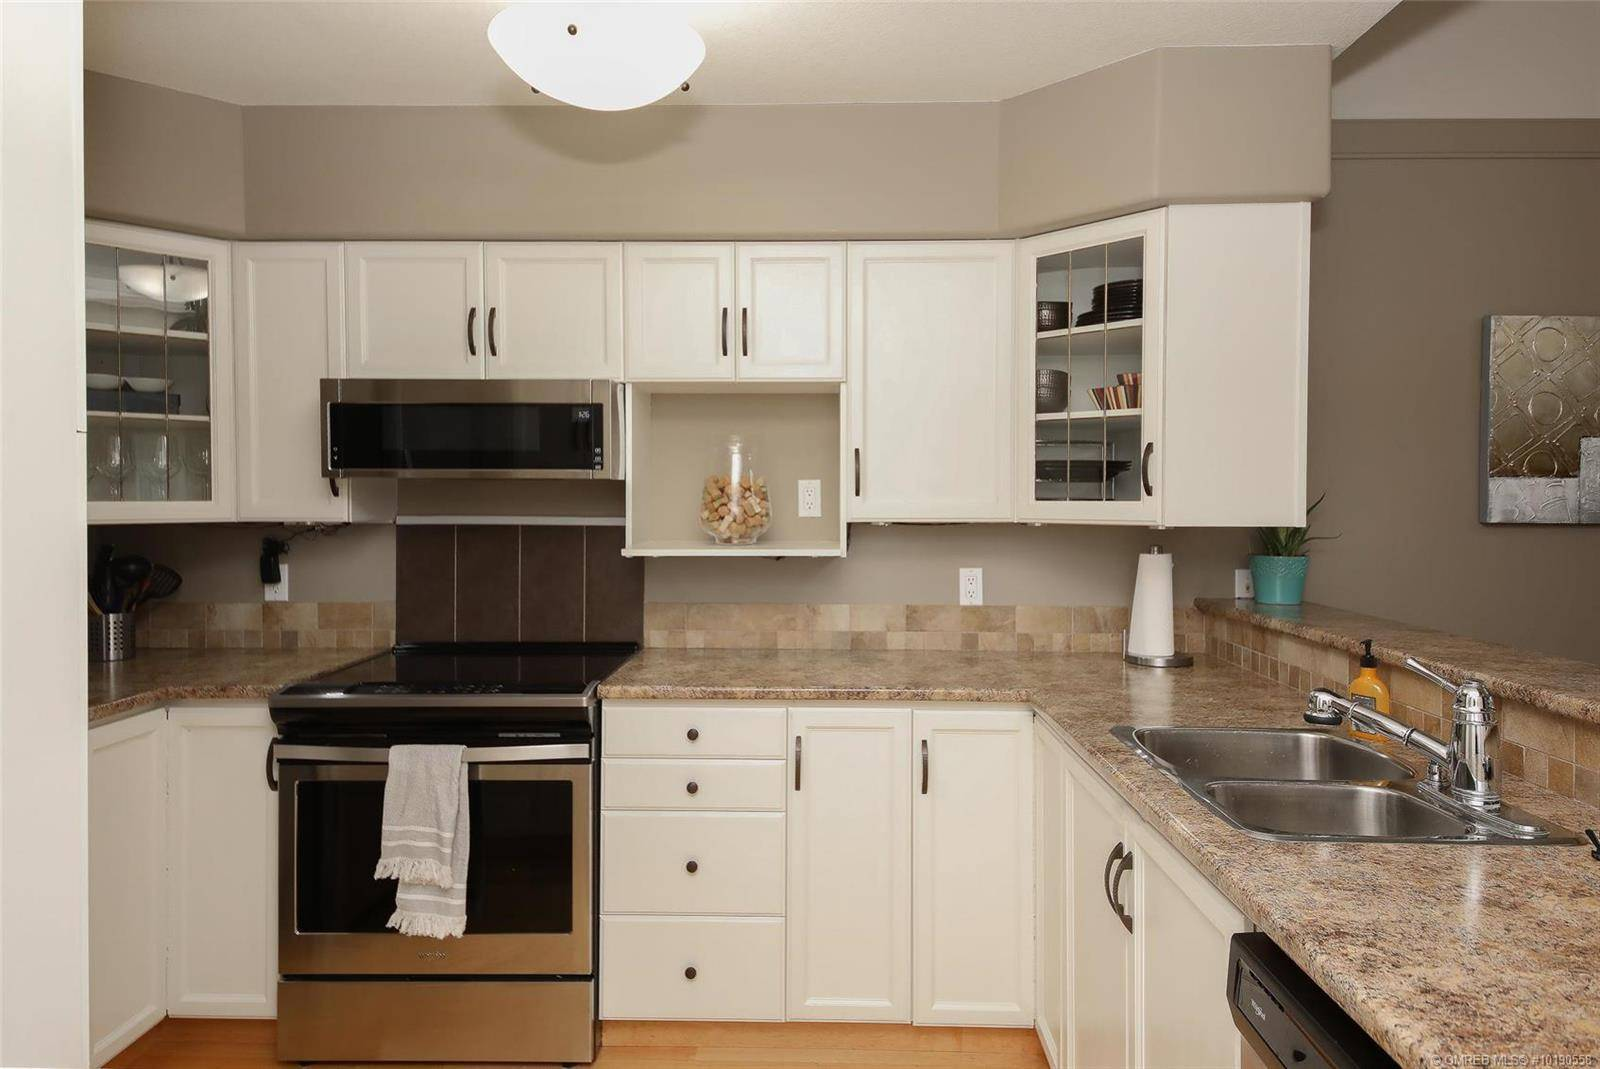 Condo for sale at 1965 Durnin Rd Unit 303 Kelowna British Columbia - MLS: 10190558